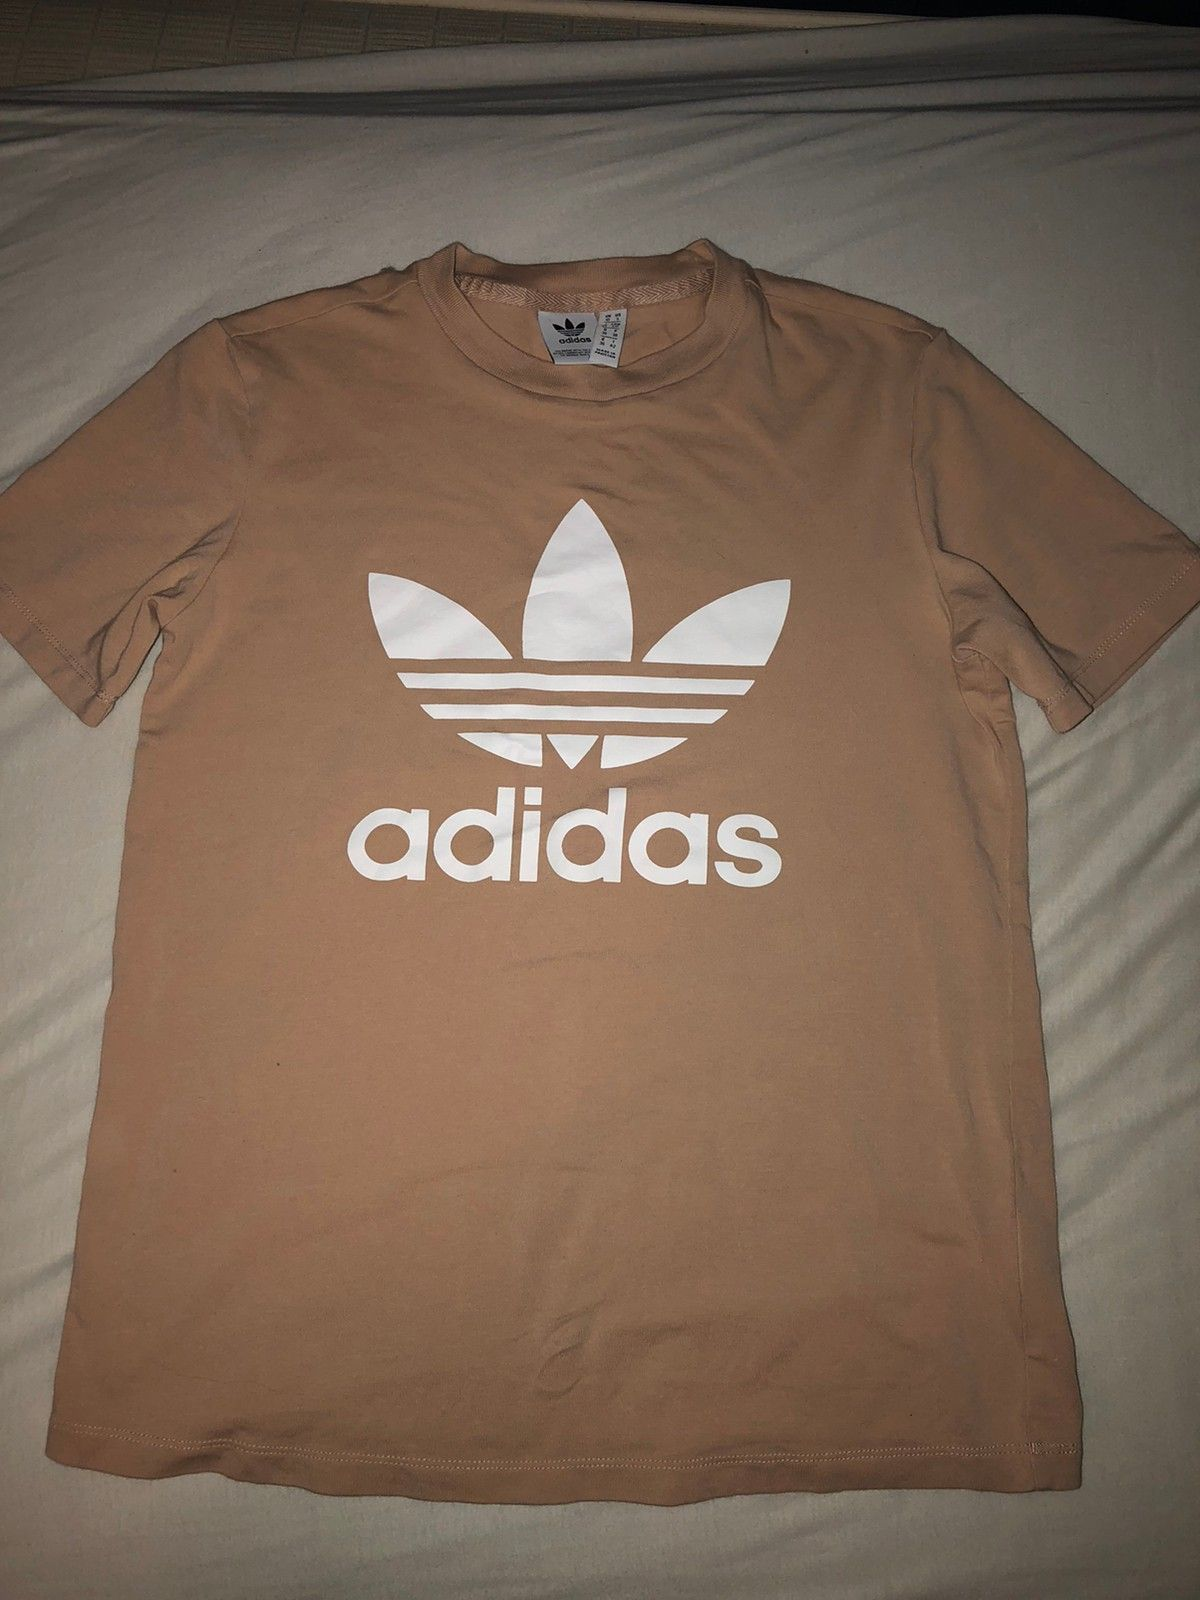 Adidas t skjorte | FINN.no